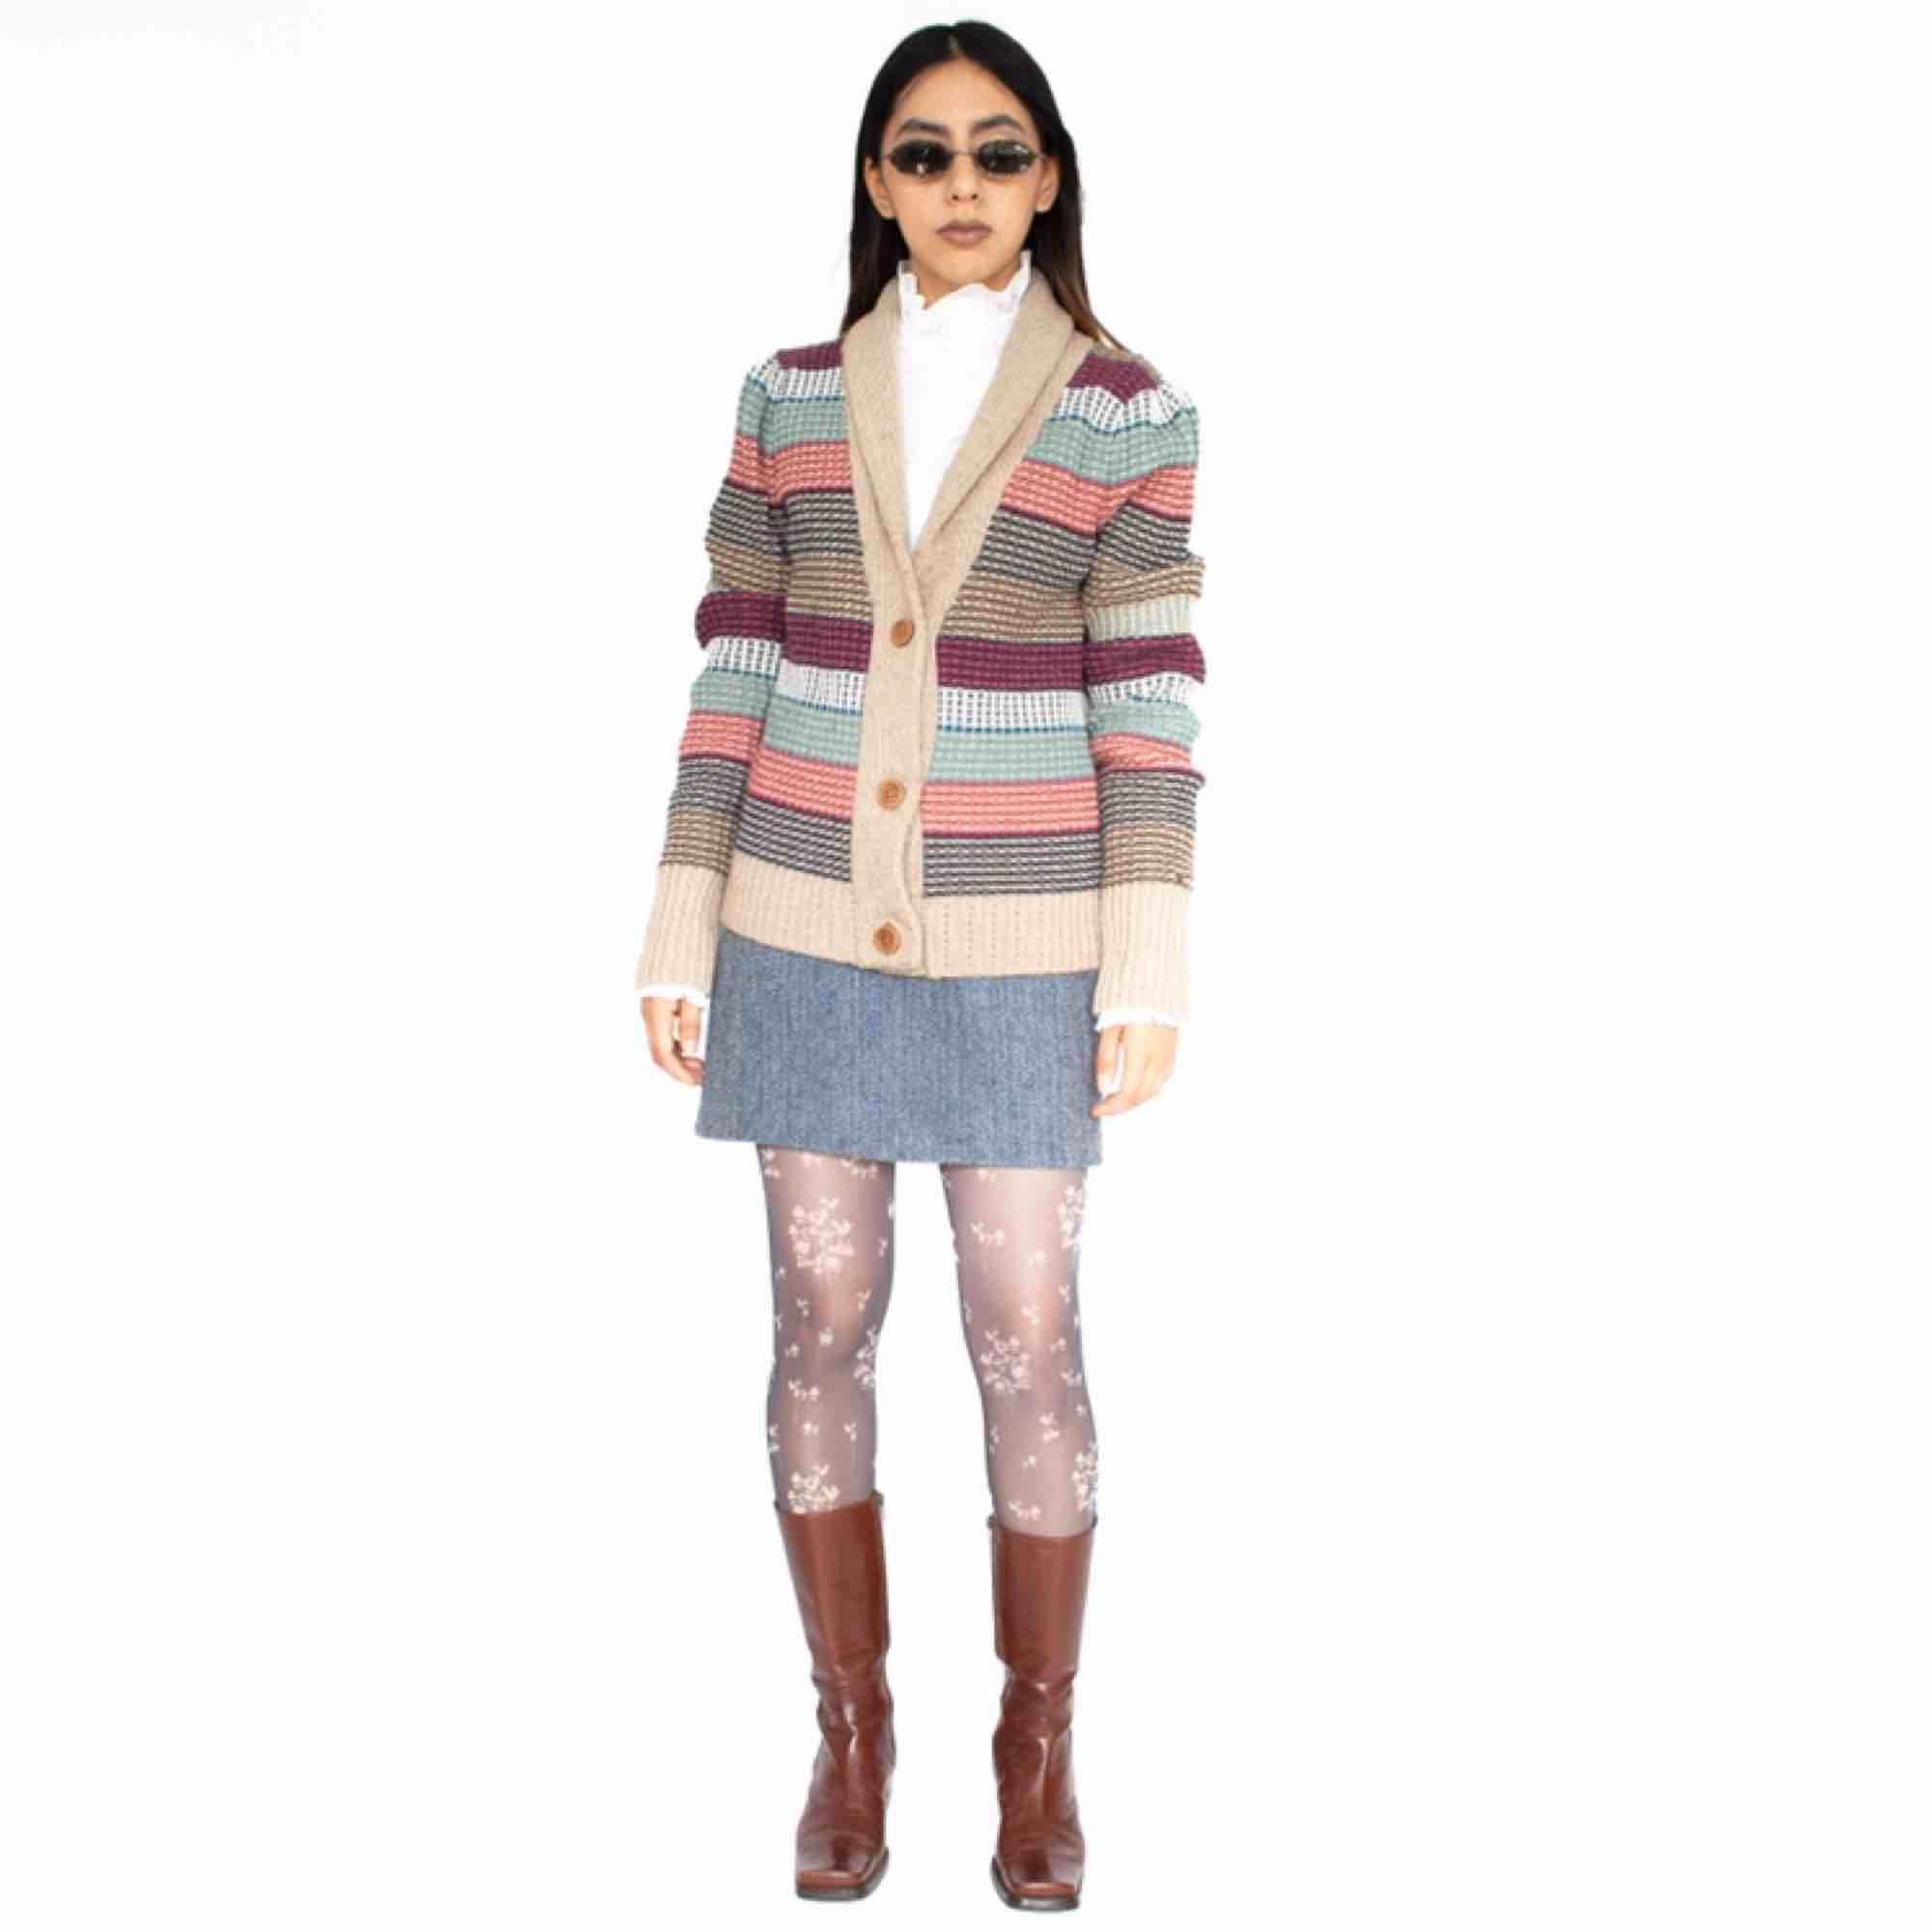 Tommy Hilfiger Denim cotton wool blend multicolored striped cardigan SIZE Label: L, but fits best XS-S Model: 165/XS Measurements (flat): Length: 65 cm pit to pit: 48 cm Free shipping! Read full description at our website majorunit.com No returns . Tröjor & Koftor.